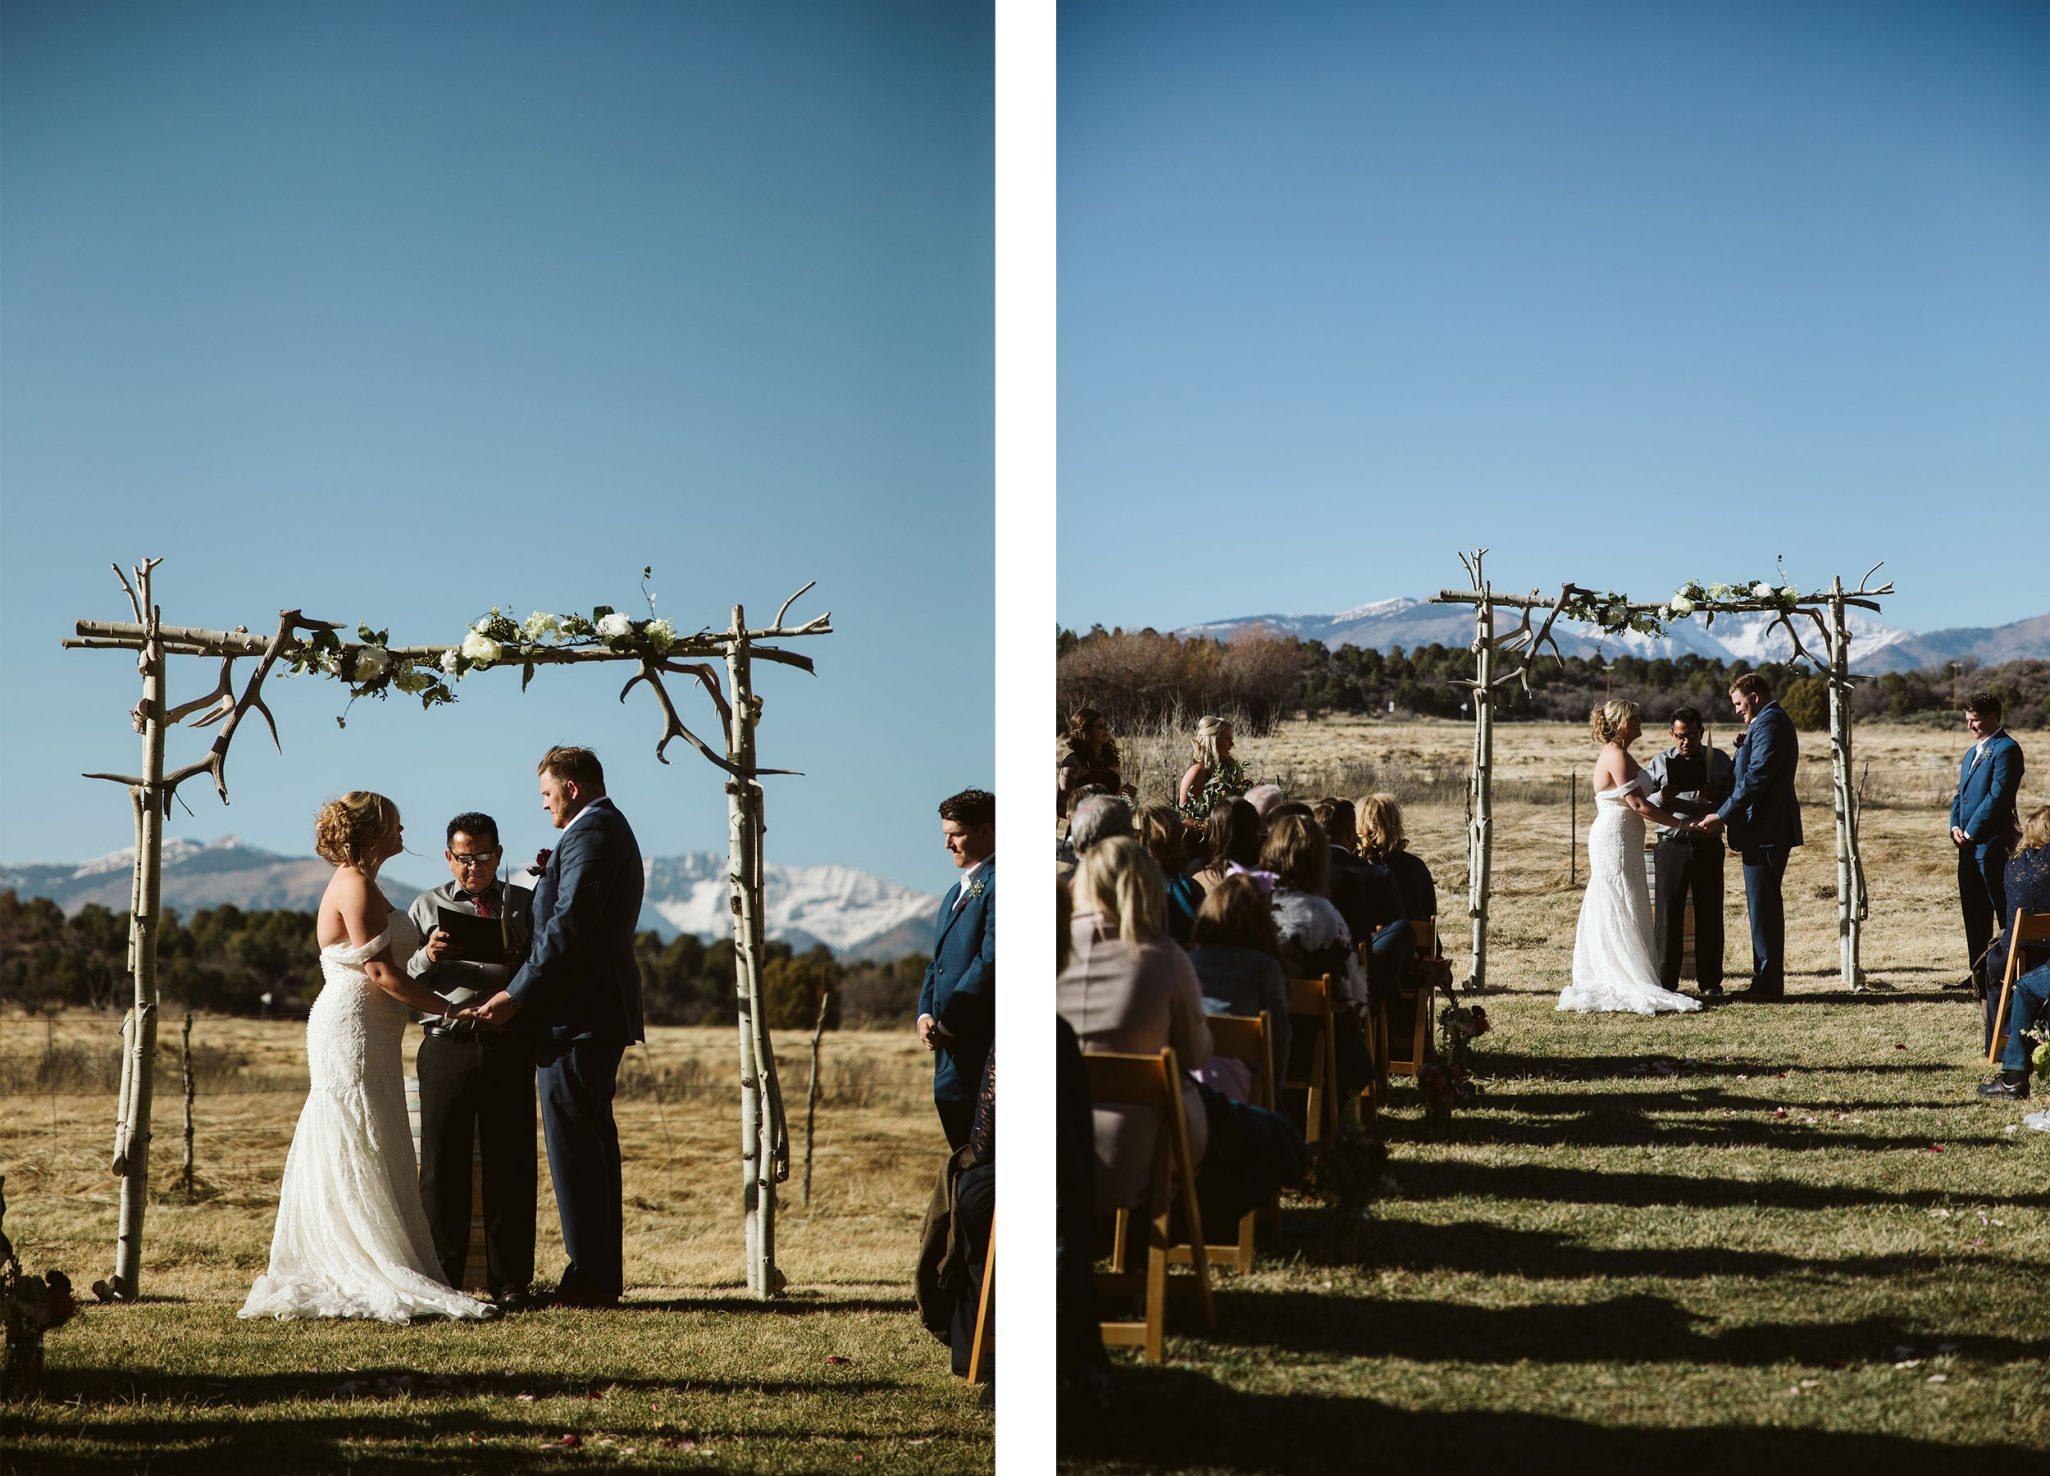 Outdoor ceremony at Ridgewood Event Center via Durango Weddings Magazine